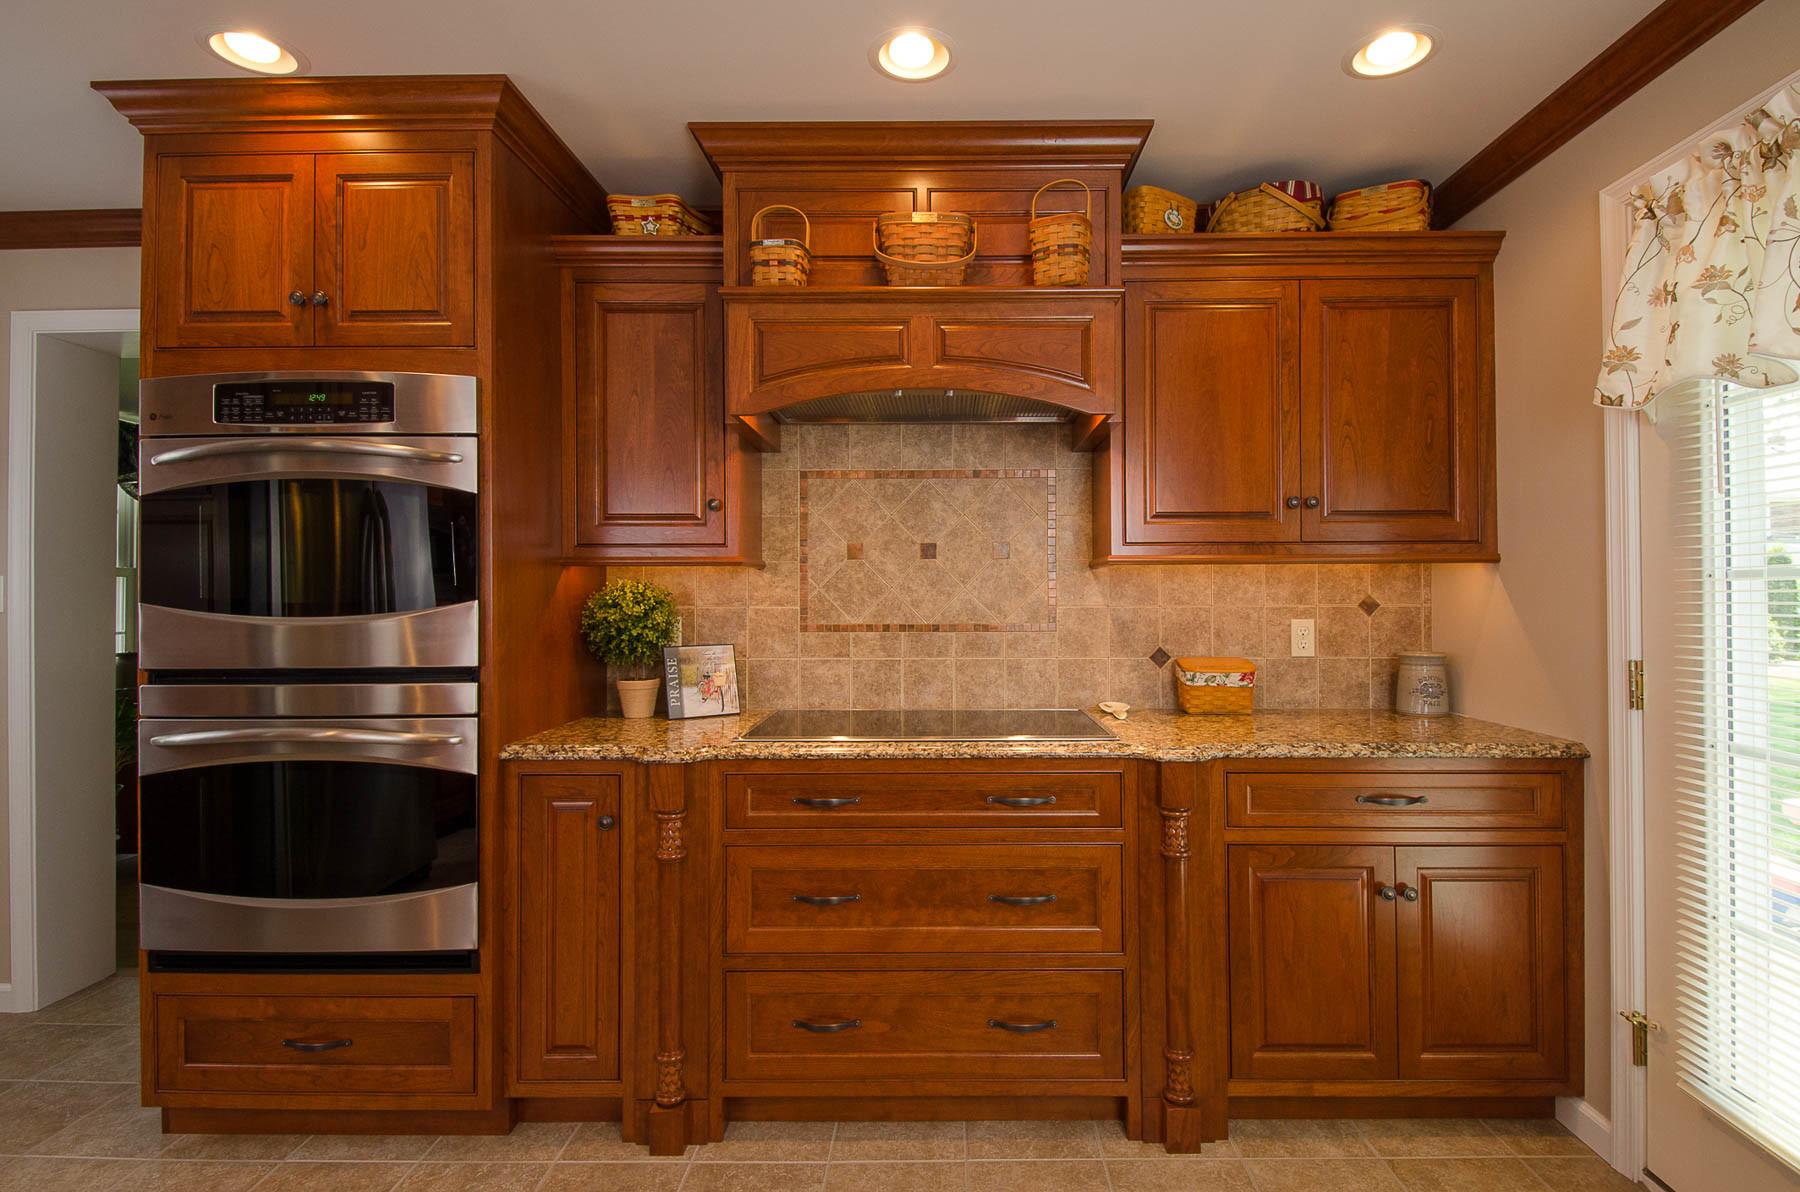 Kitchen Cabinets Rta Espresso Stained